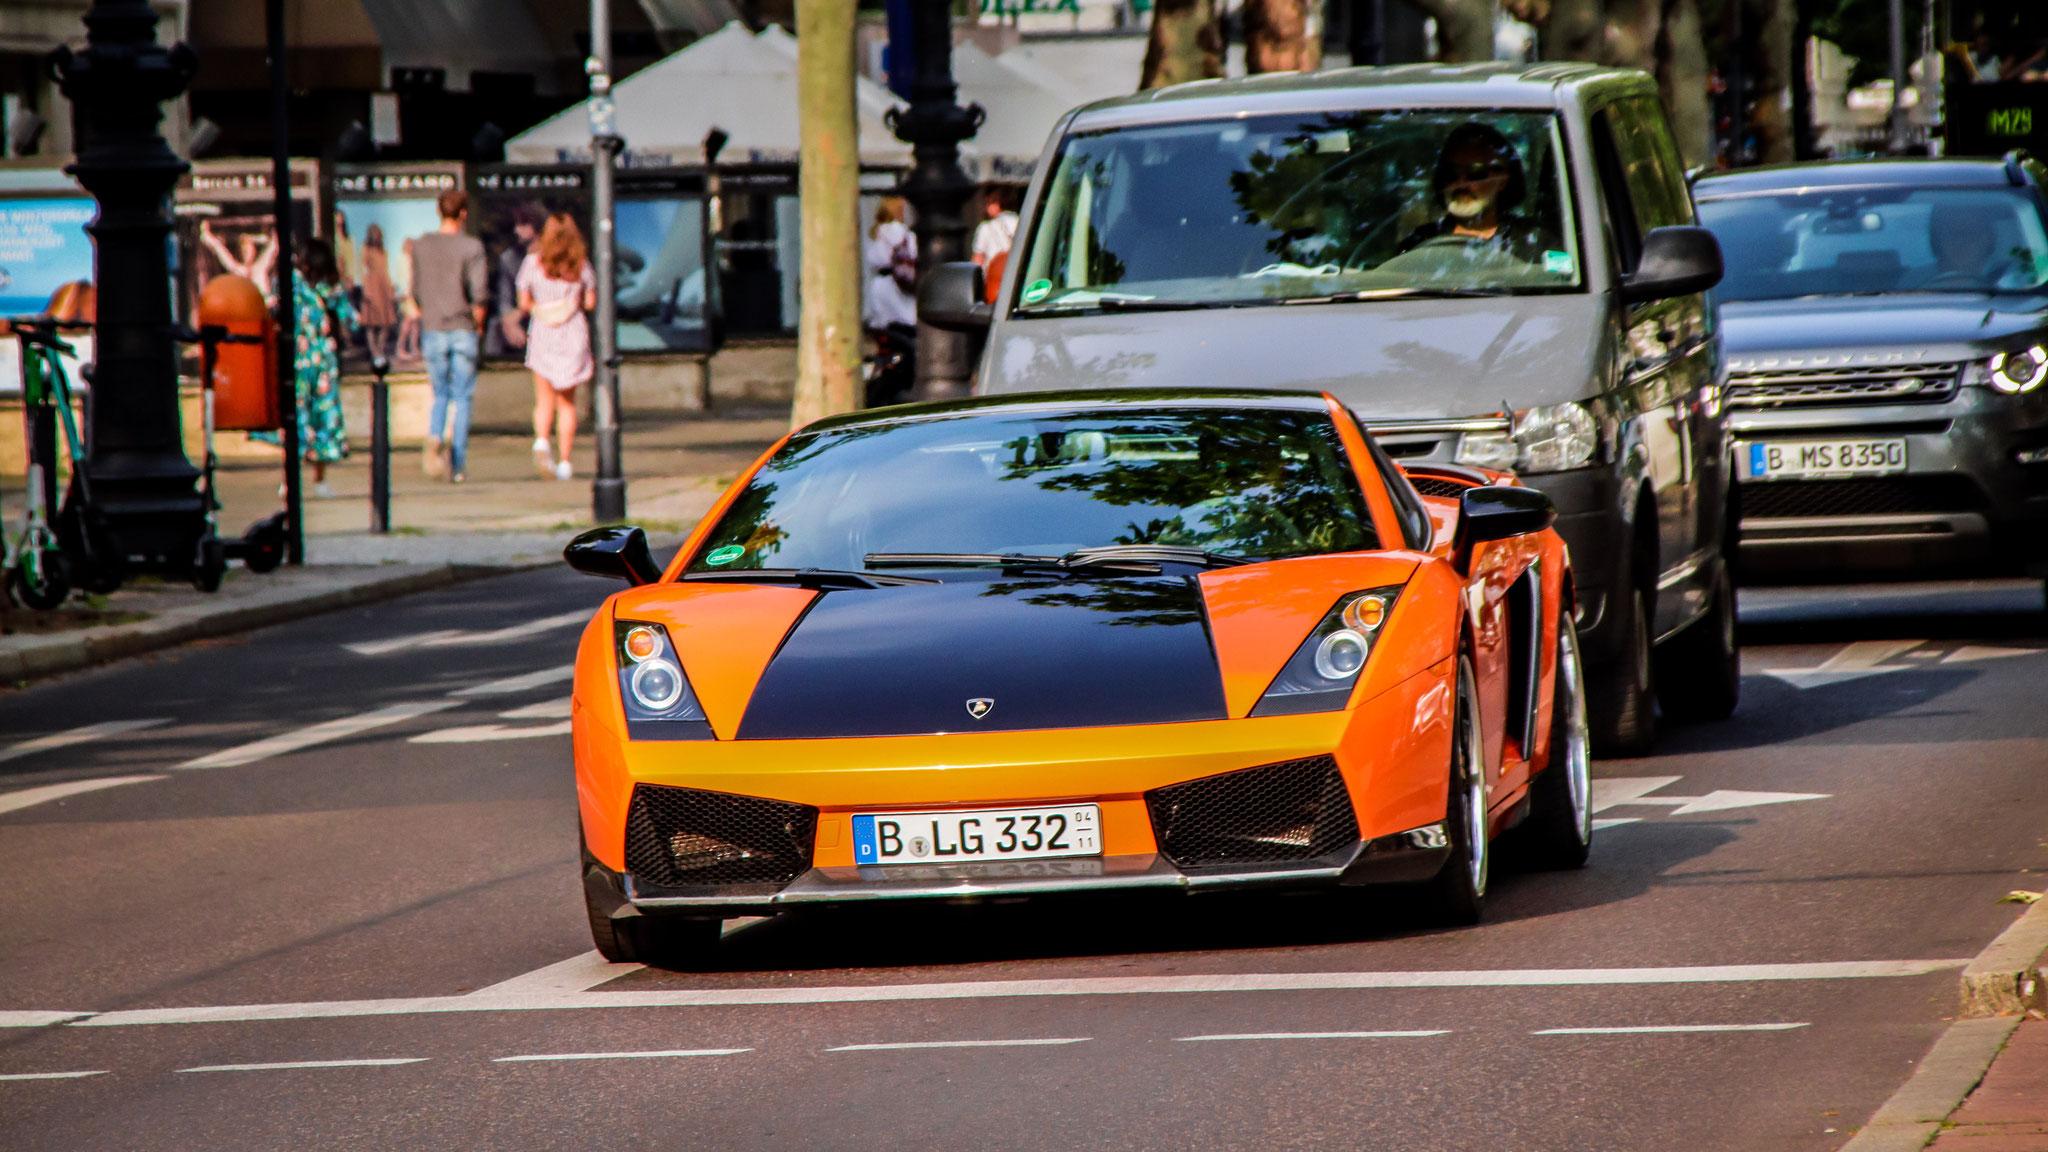 Lamborghini Gallardo - B-LG-332